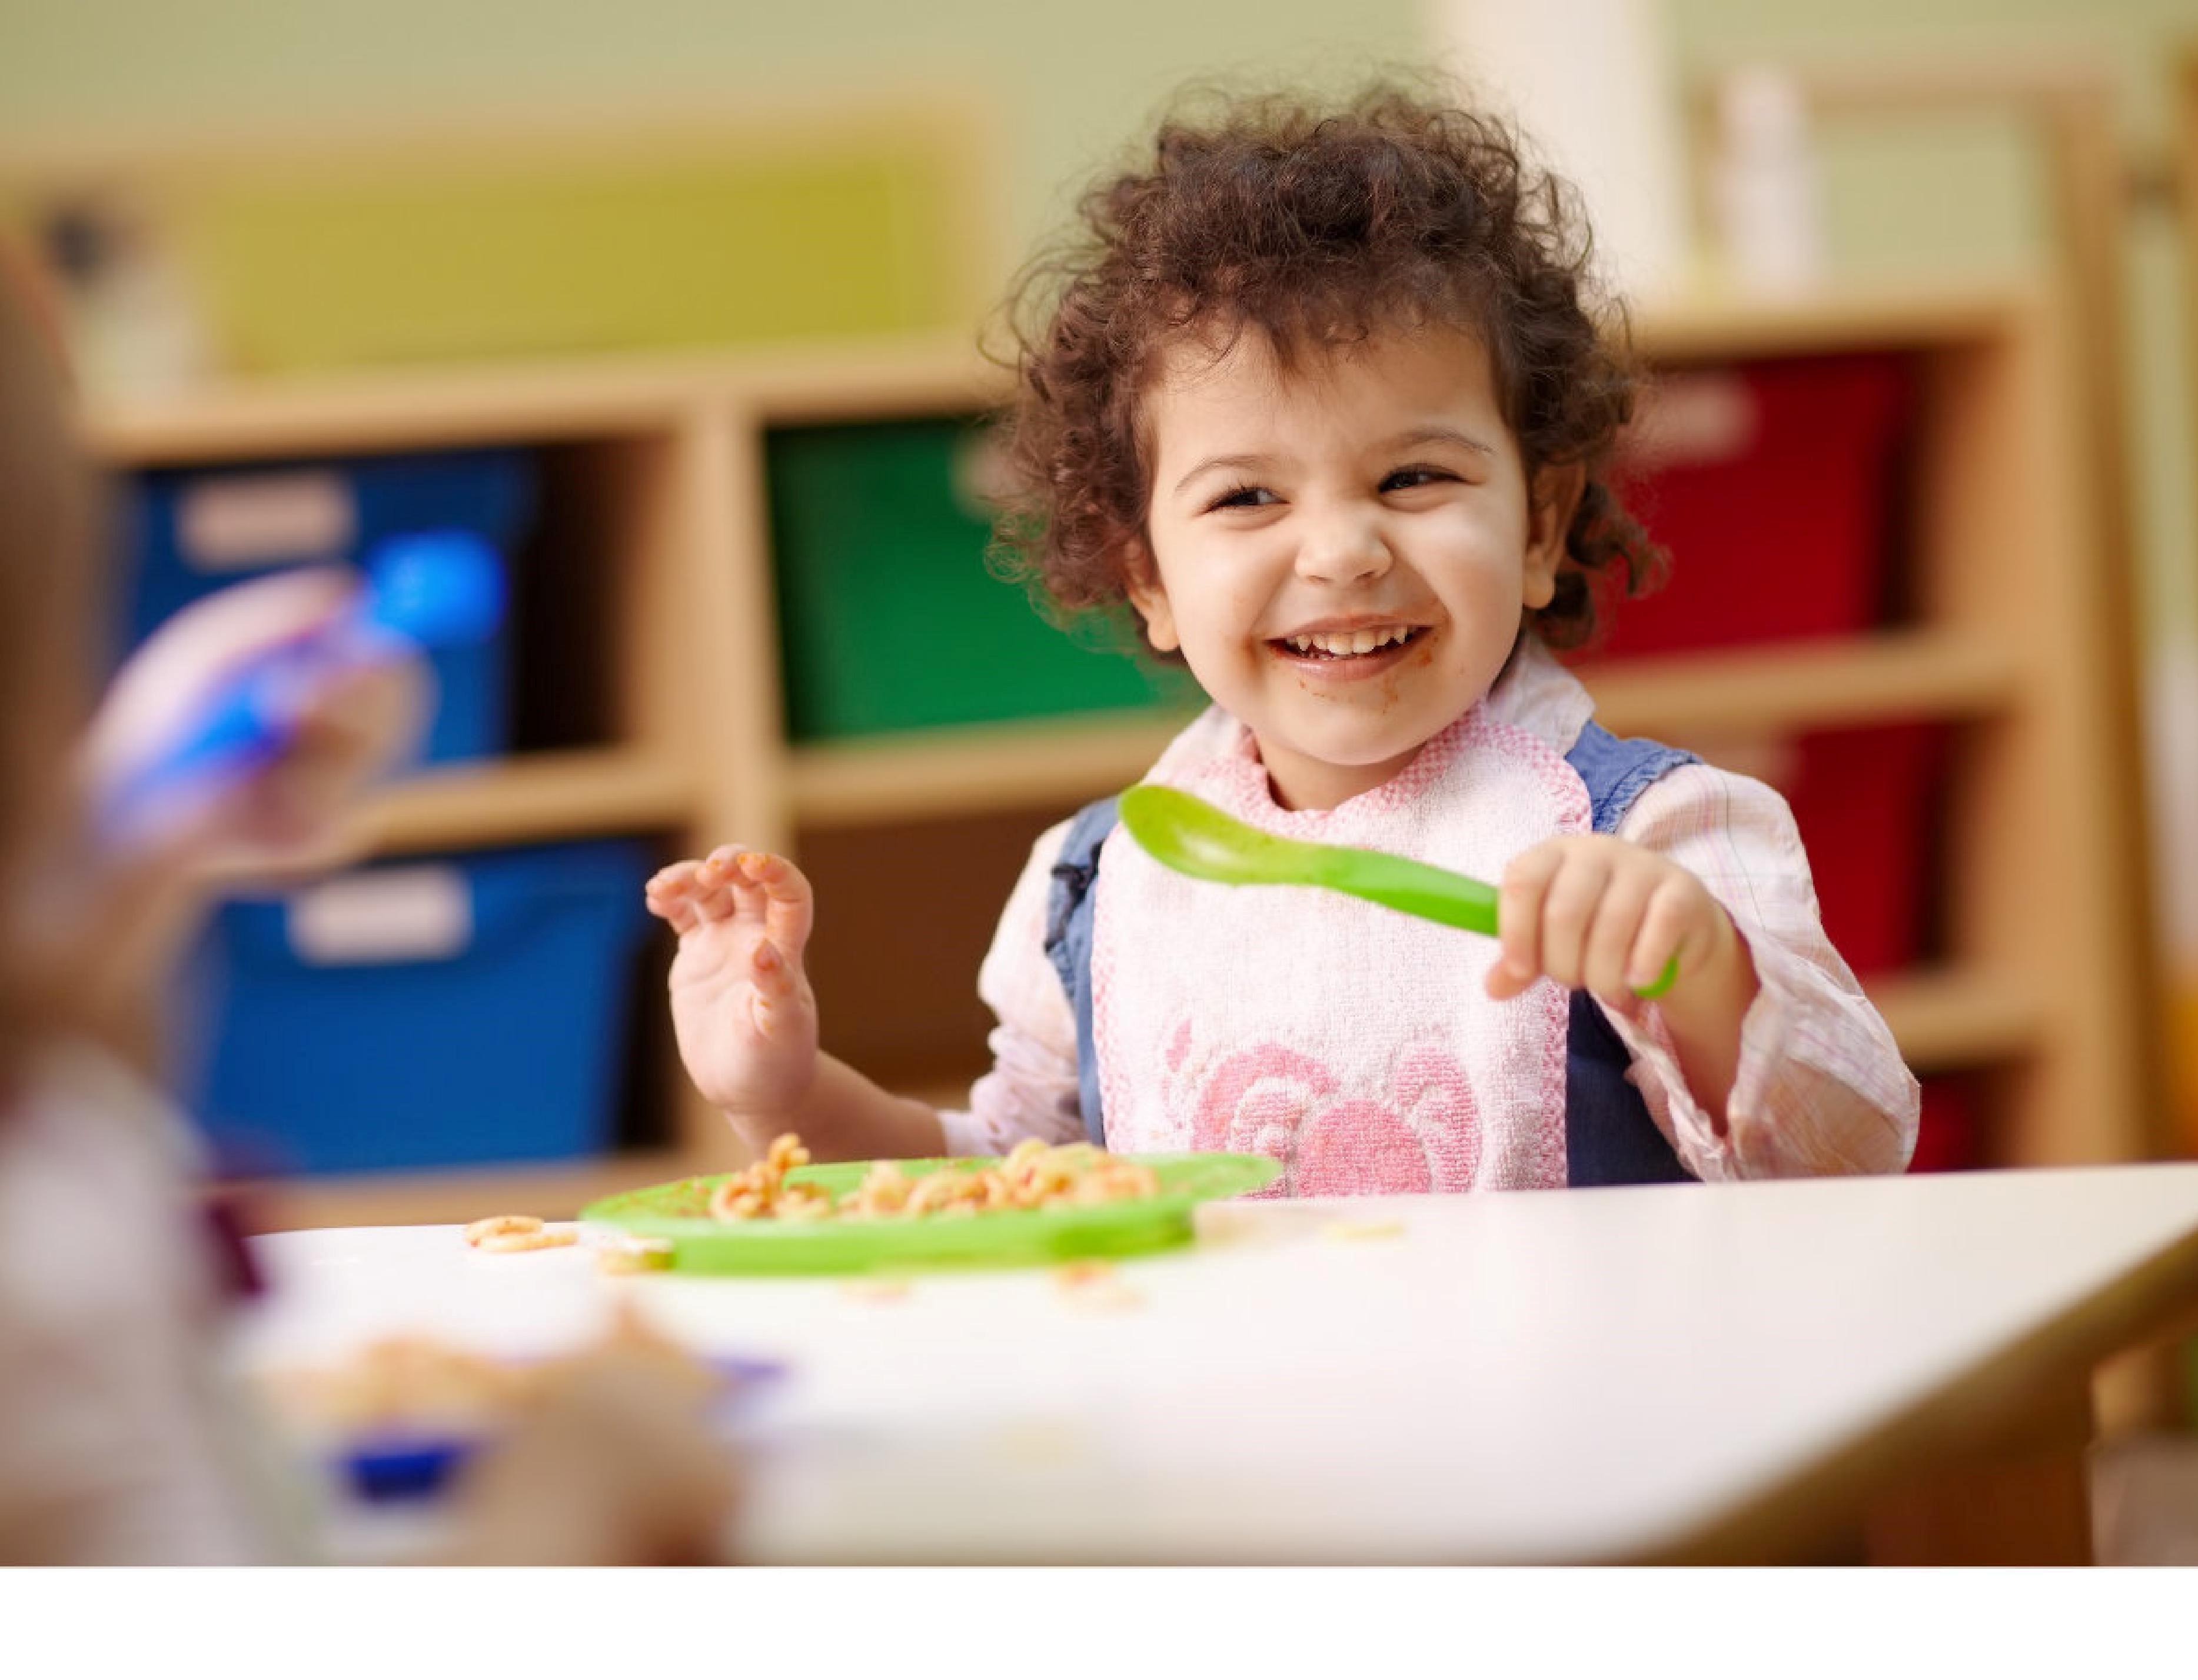 Vikki Slade calls on council to support local children